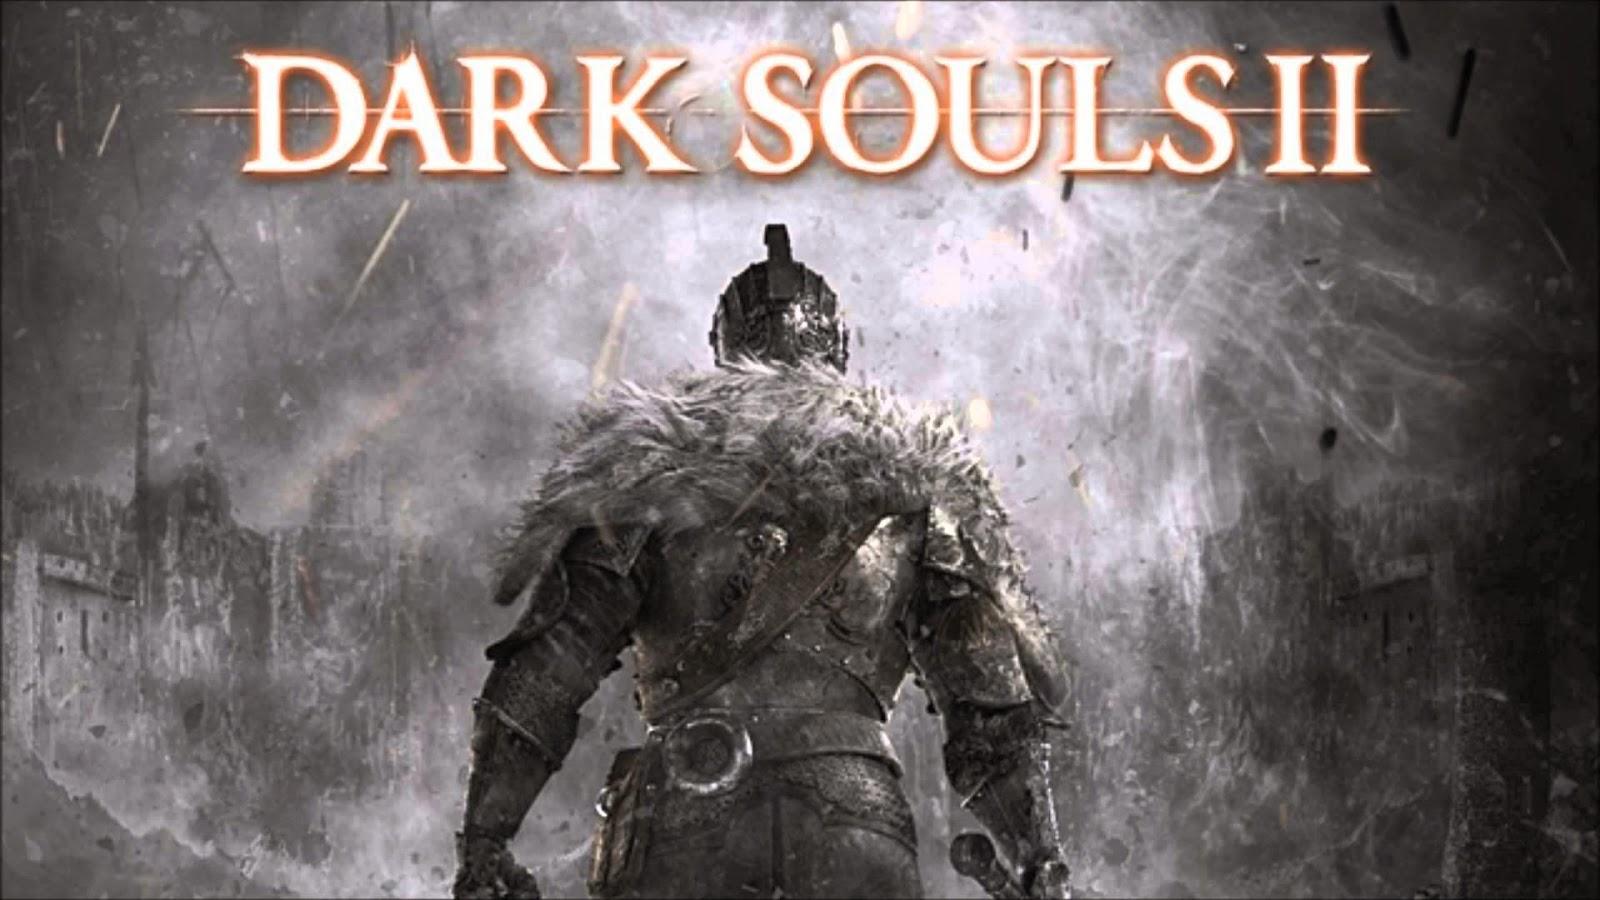 Dark Souls 2 Wallpaper Hd: Dark Souls 2 HD Wallpapers